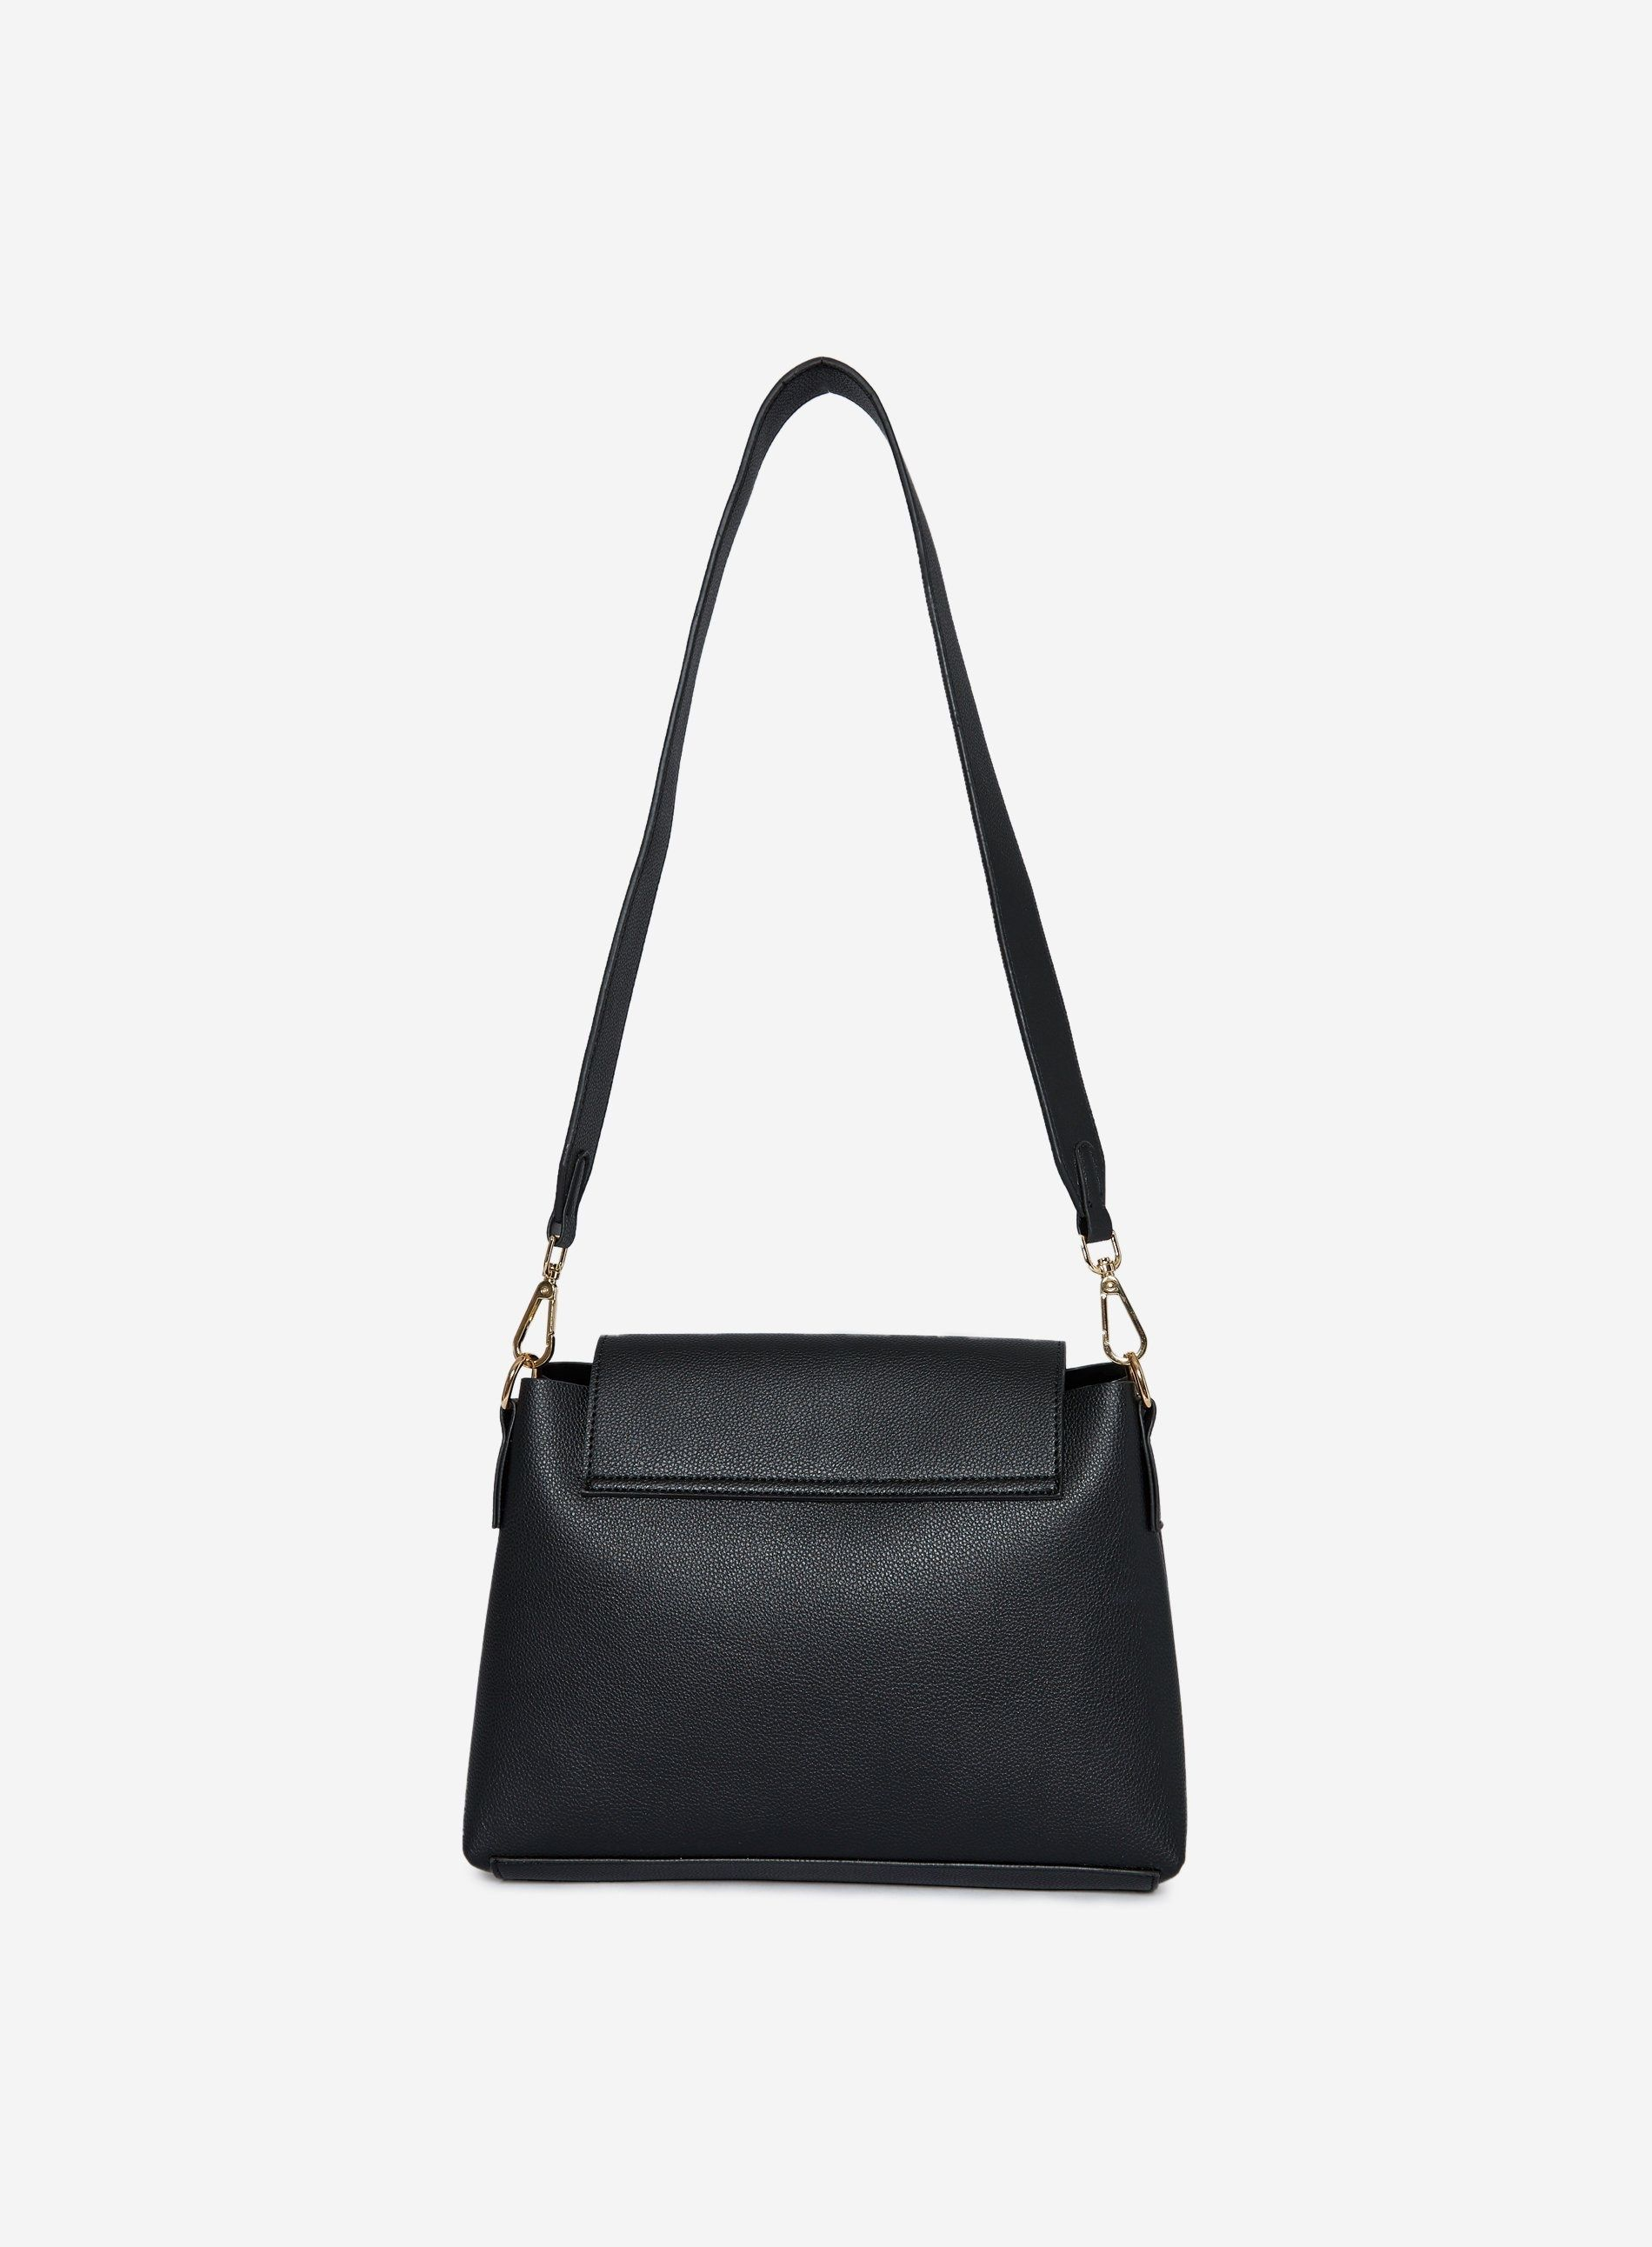 Dorothy Perkins Womens Black Soft Pushlock Cross Body Bag Shoulder Handbag